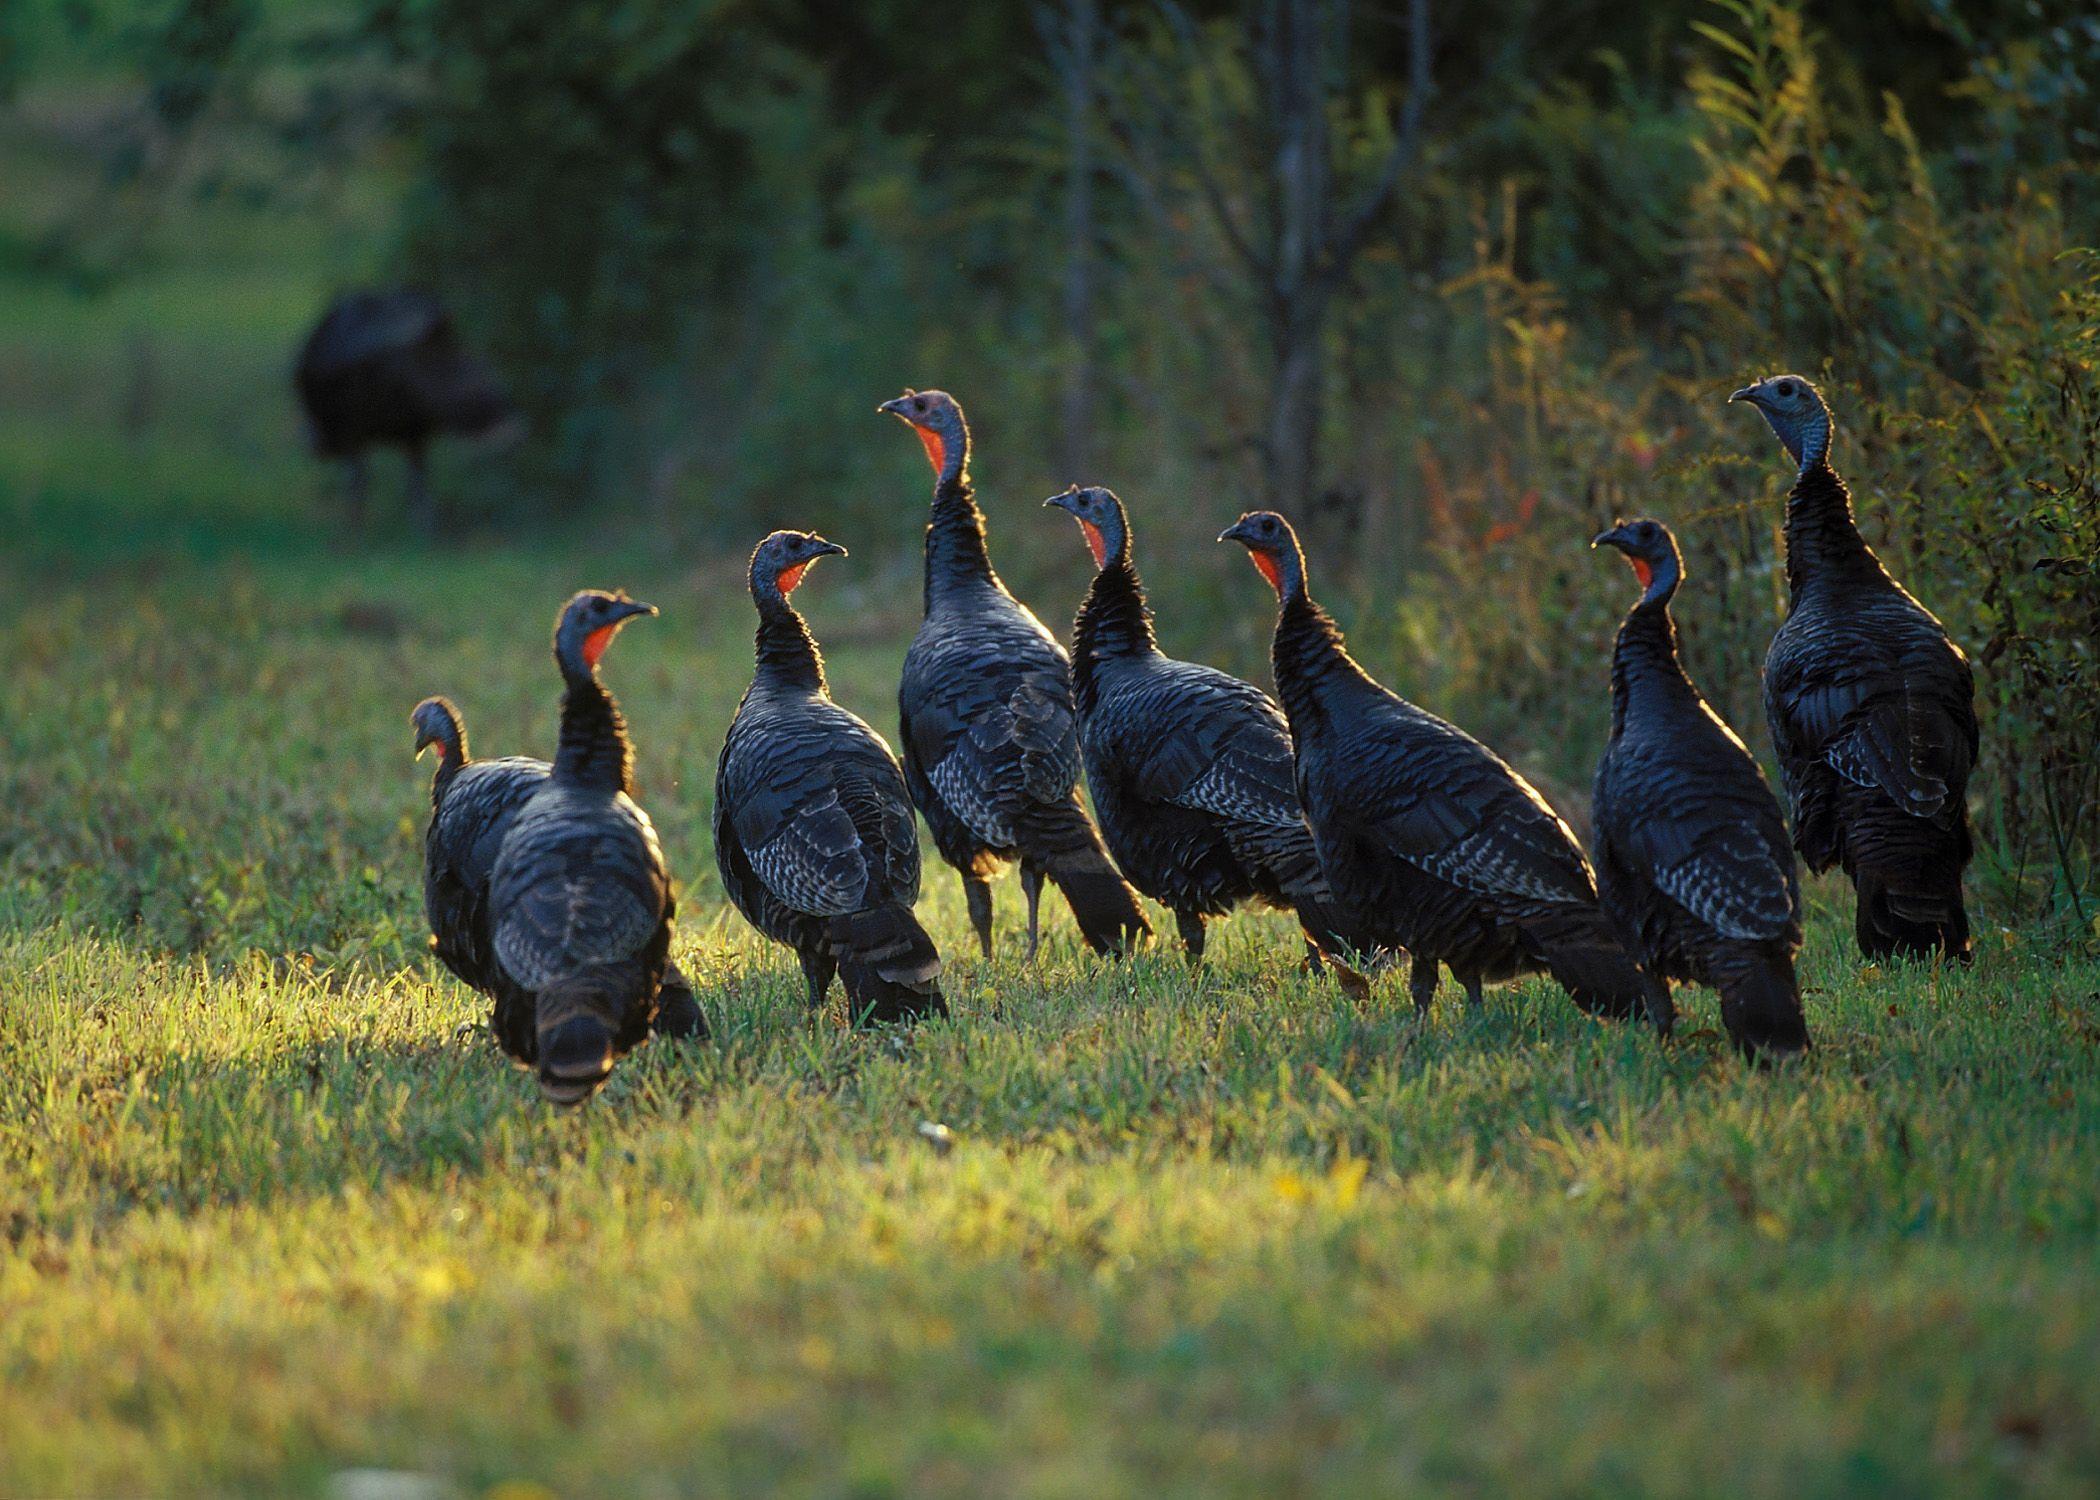 Spring Turkey Hunting Wallpapers - Top Free Spring Turkey Hunting